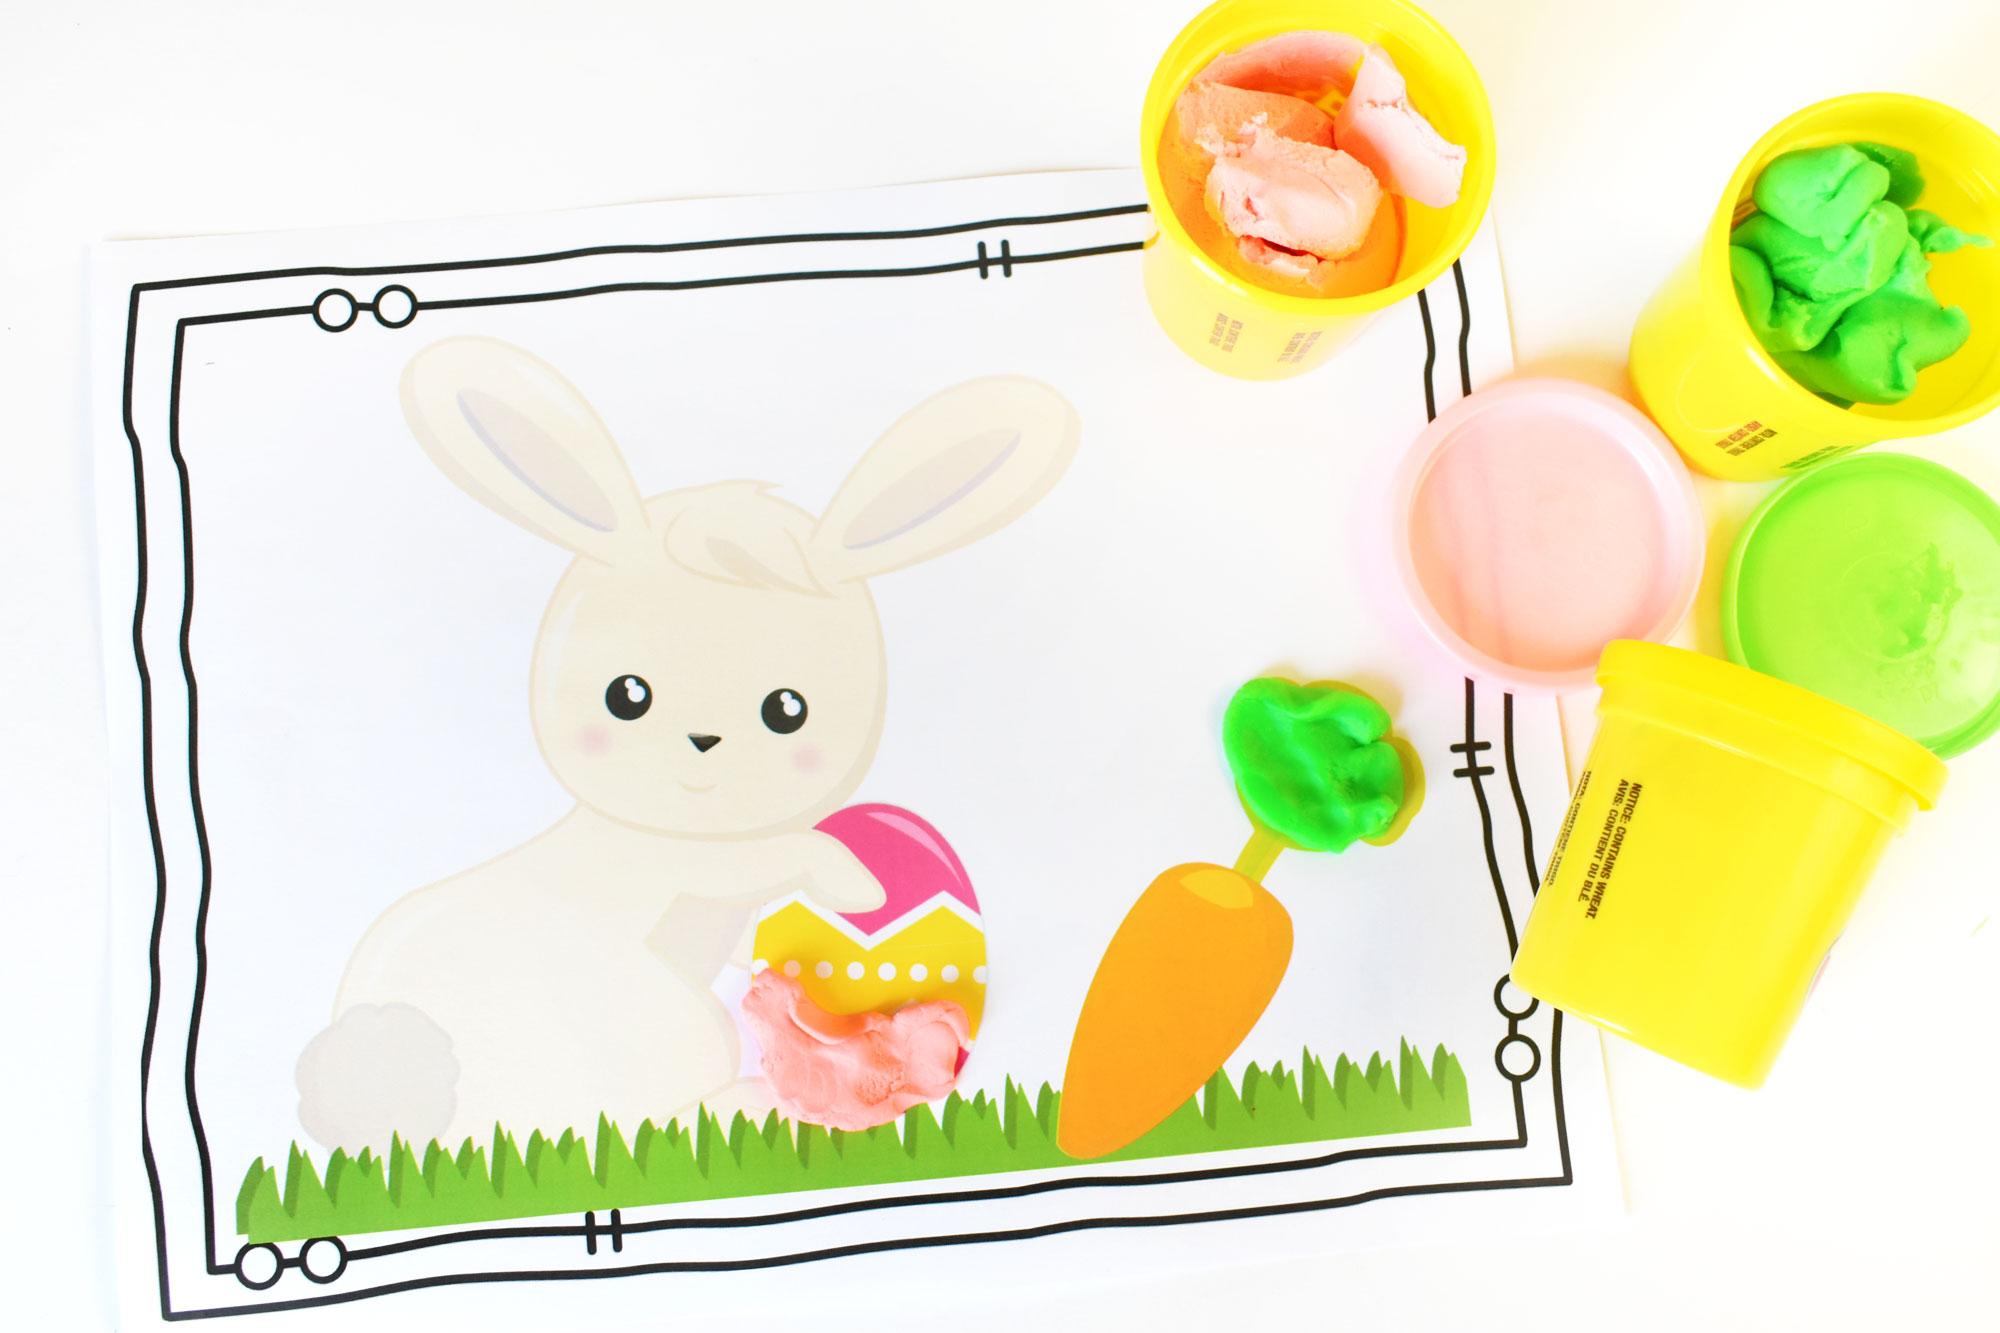 Easter Play Dough Mat Free Printable | HolidayPrintables.net #printables #easter #holidayprintables #educationprintables